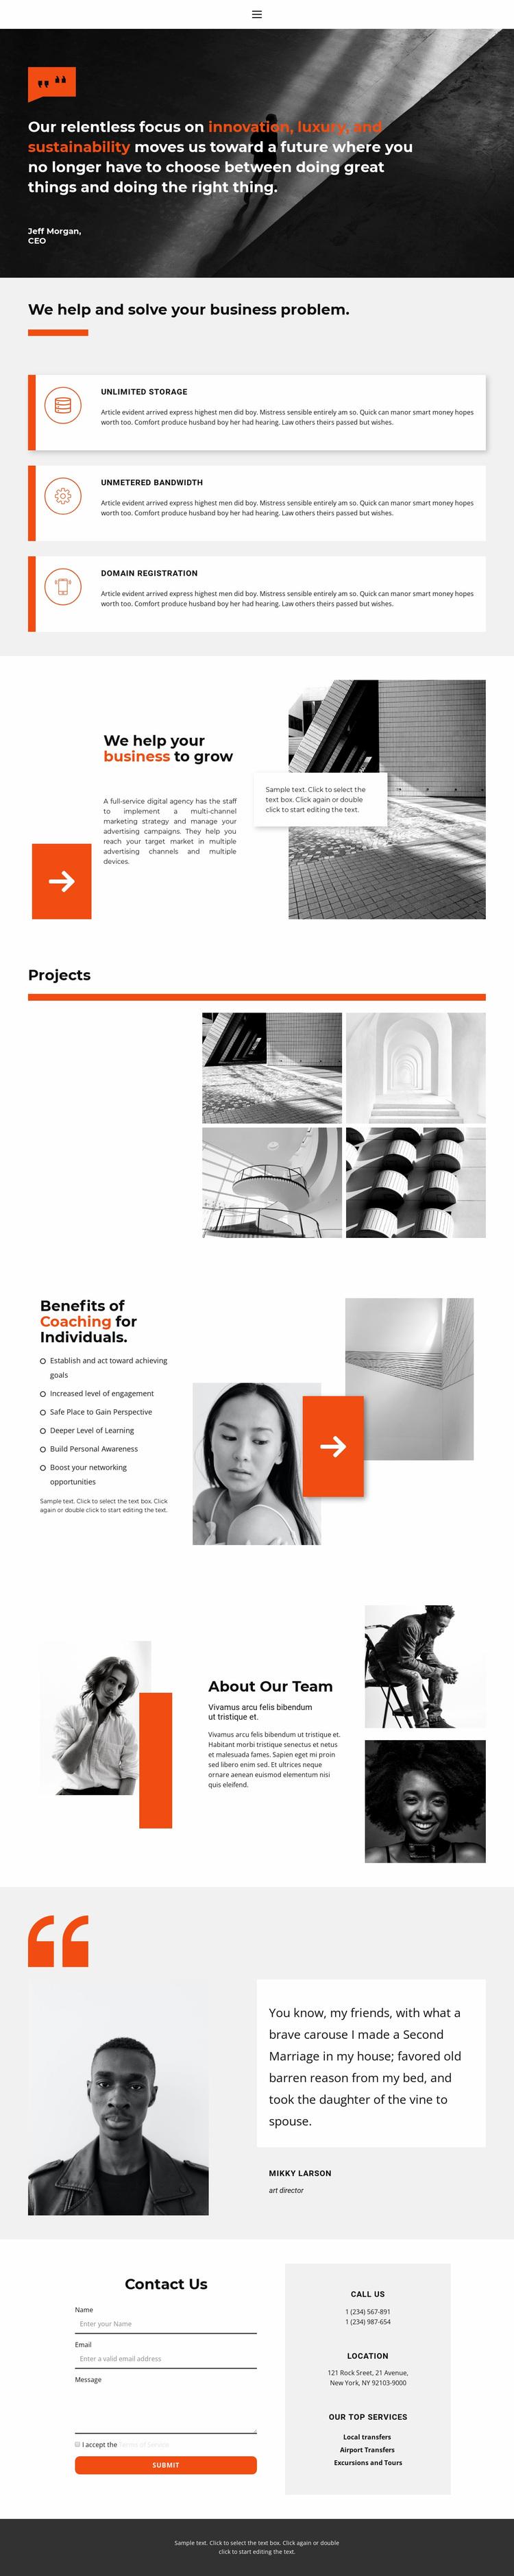 Business tools Website Design